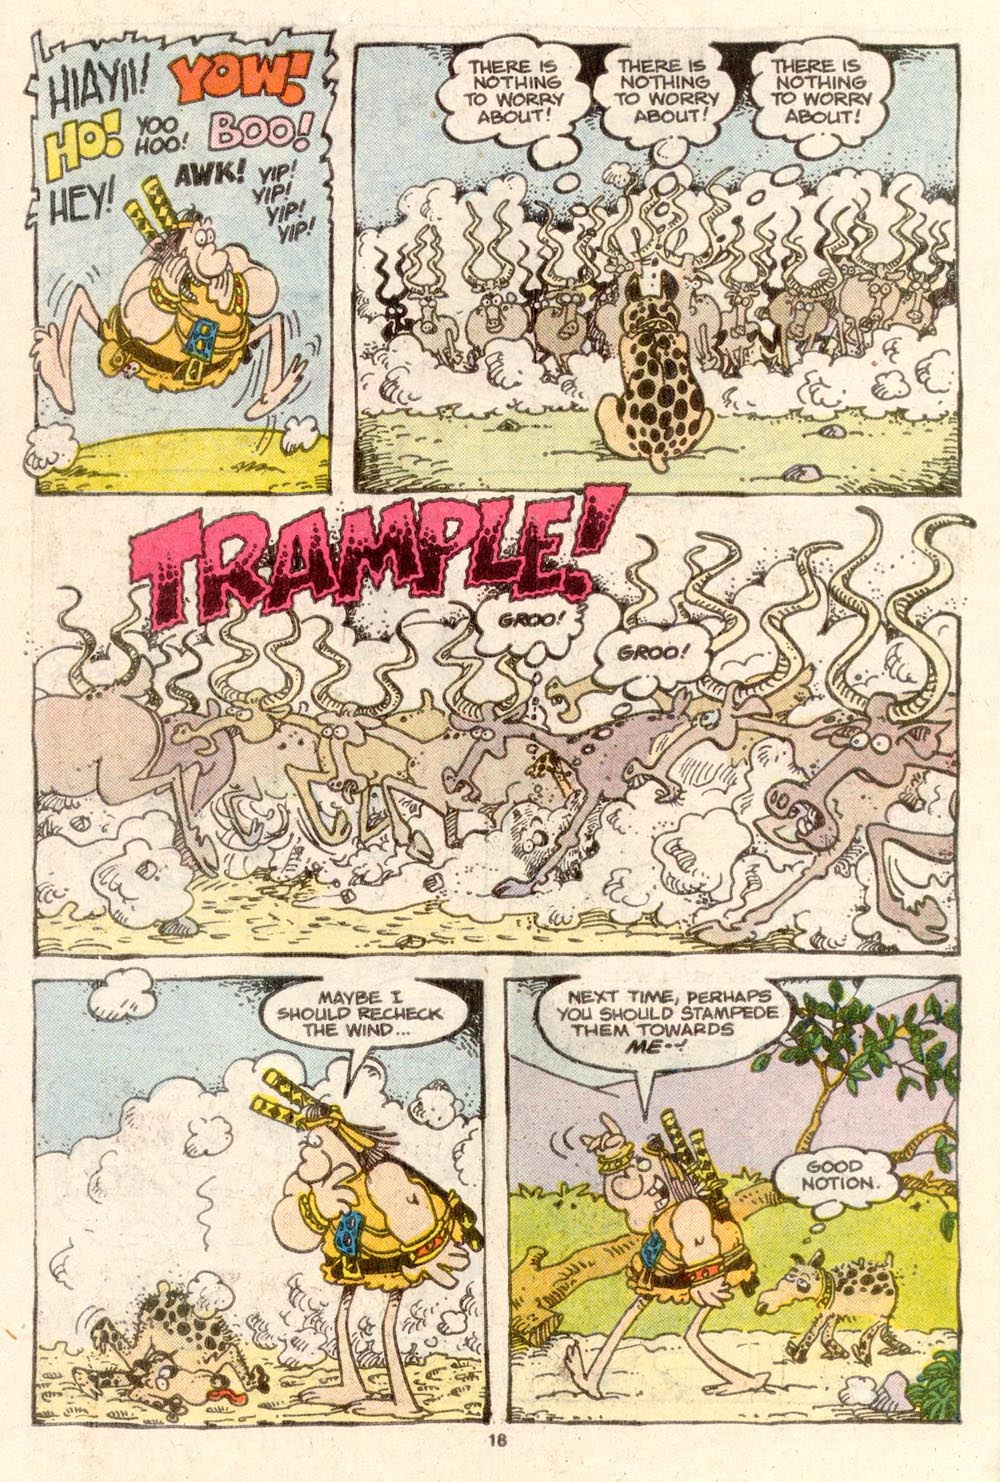 Read online Sergio Aragonés Groo the Wanderer comic -  Issue #37 - 19